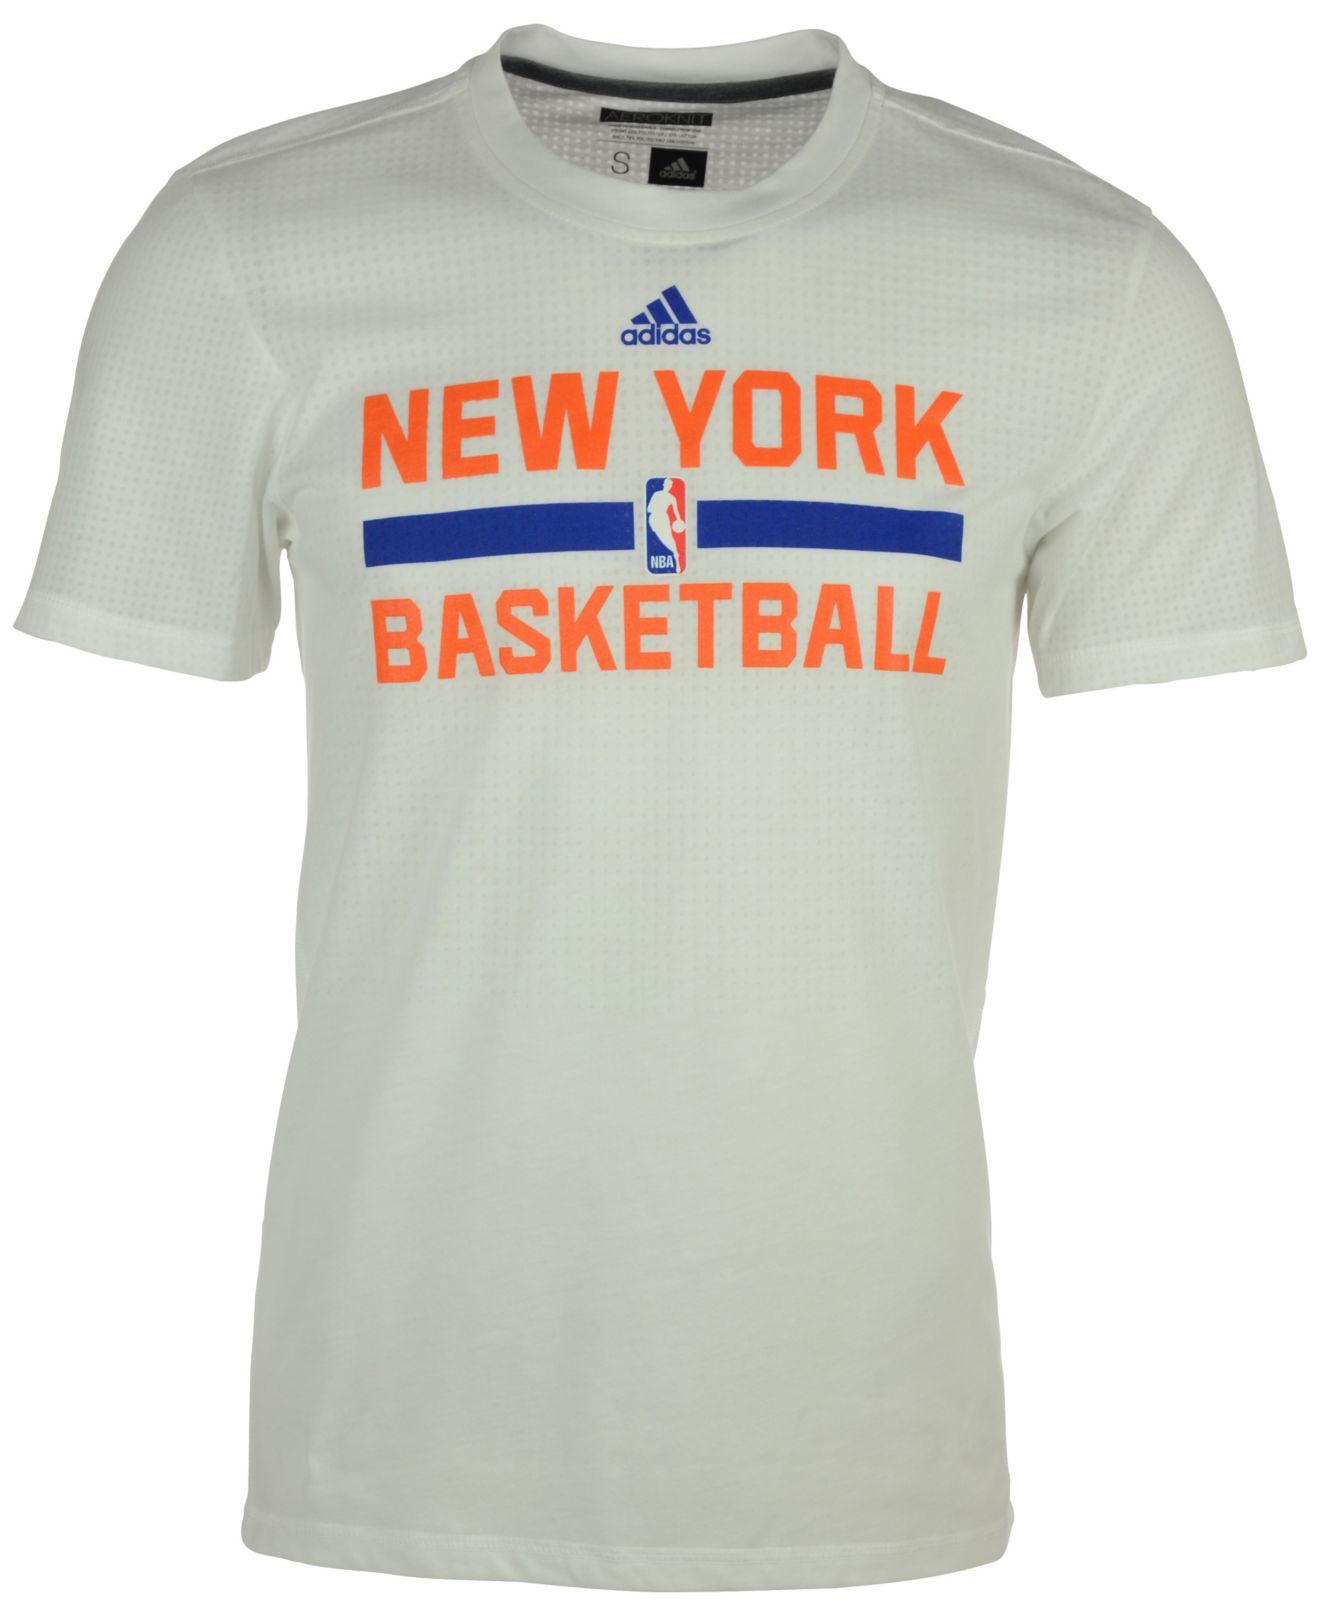 4e8e9ffb adidas Men's New York Knicks On Court Graphic Aeroknit T-shirt in ...